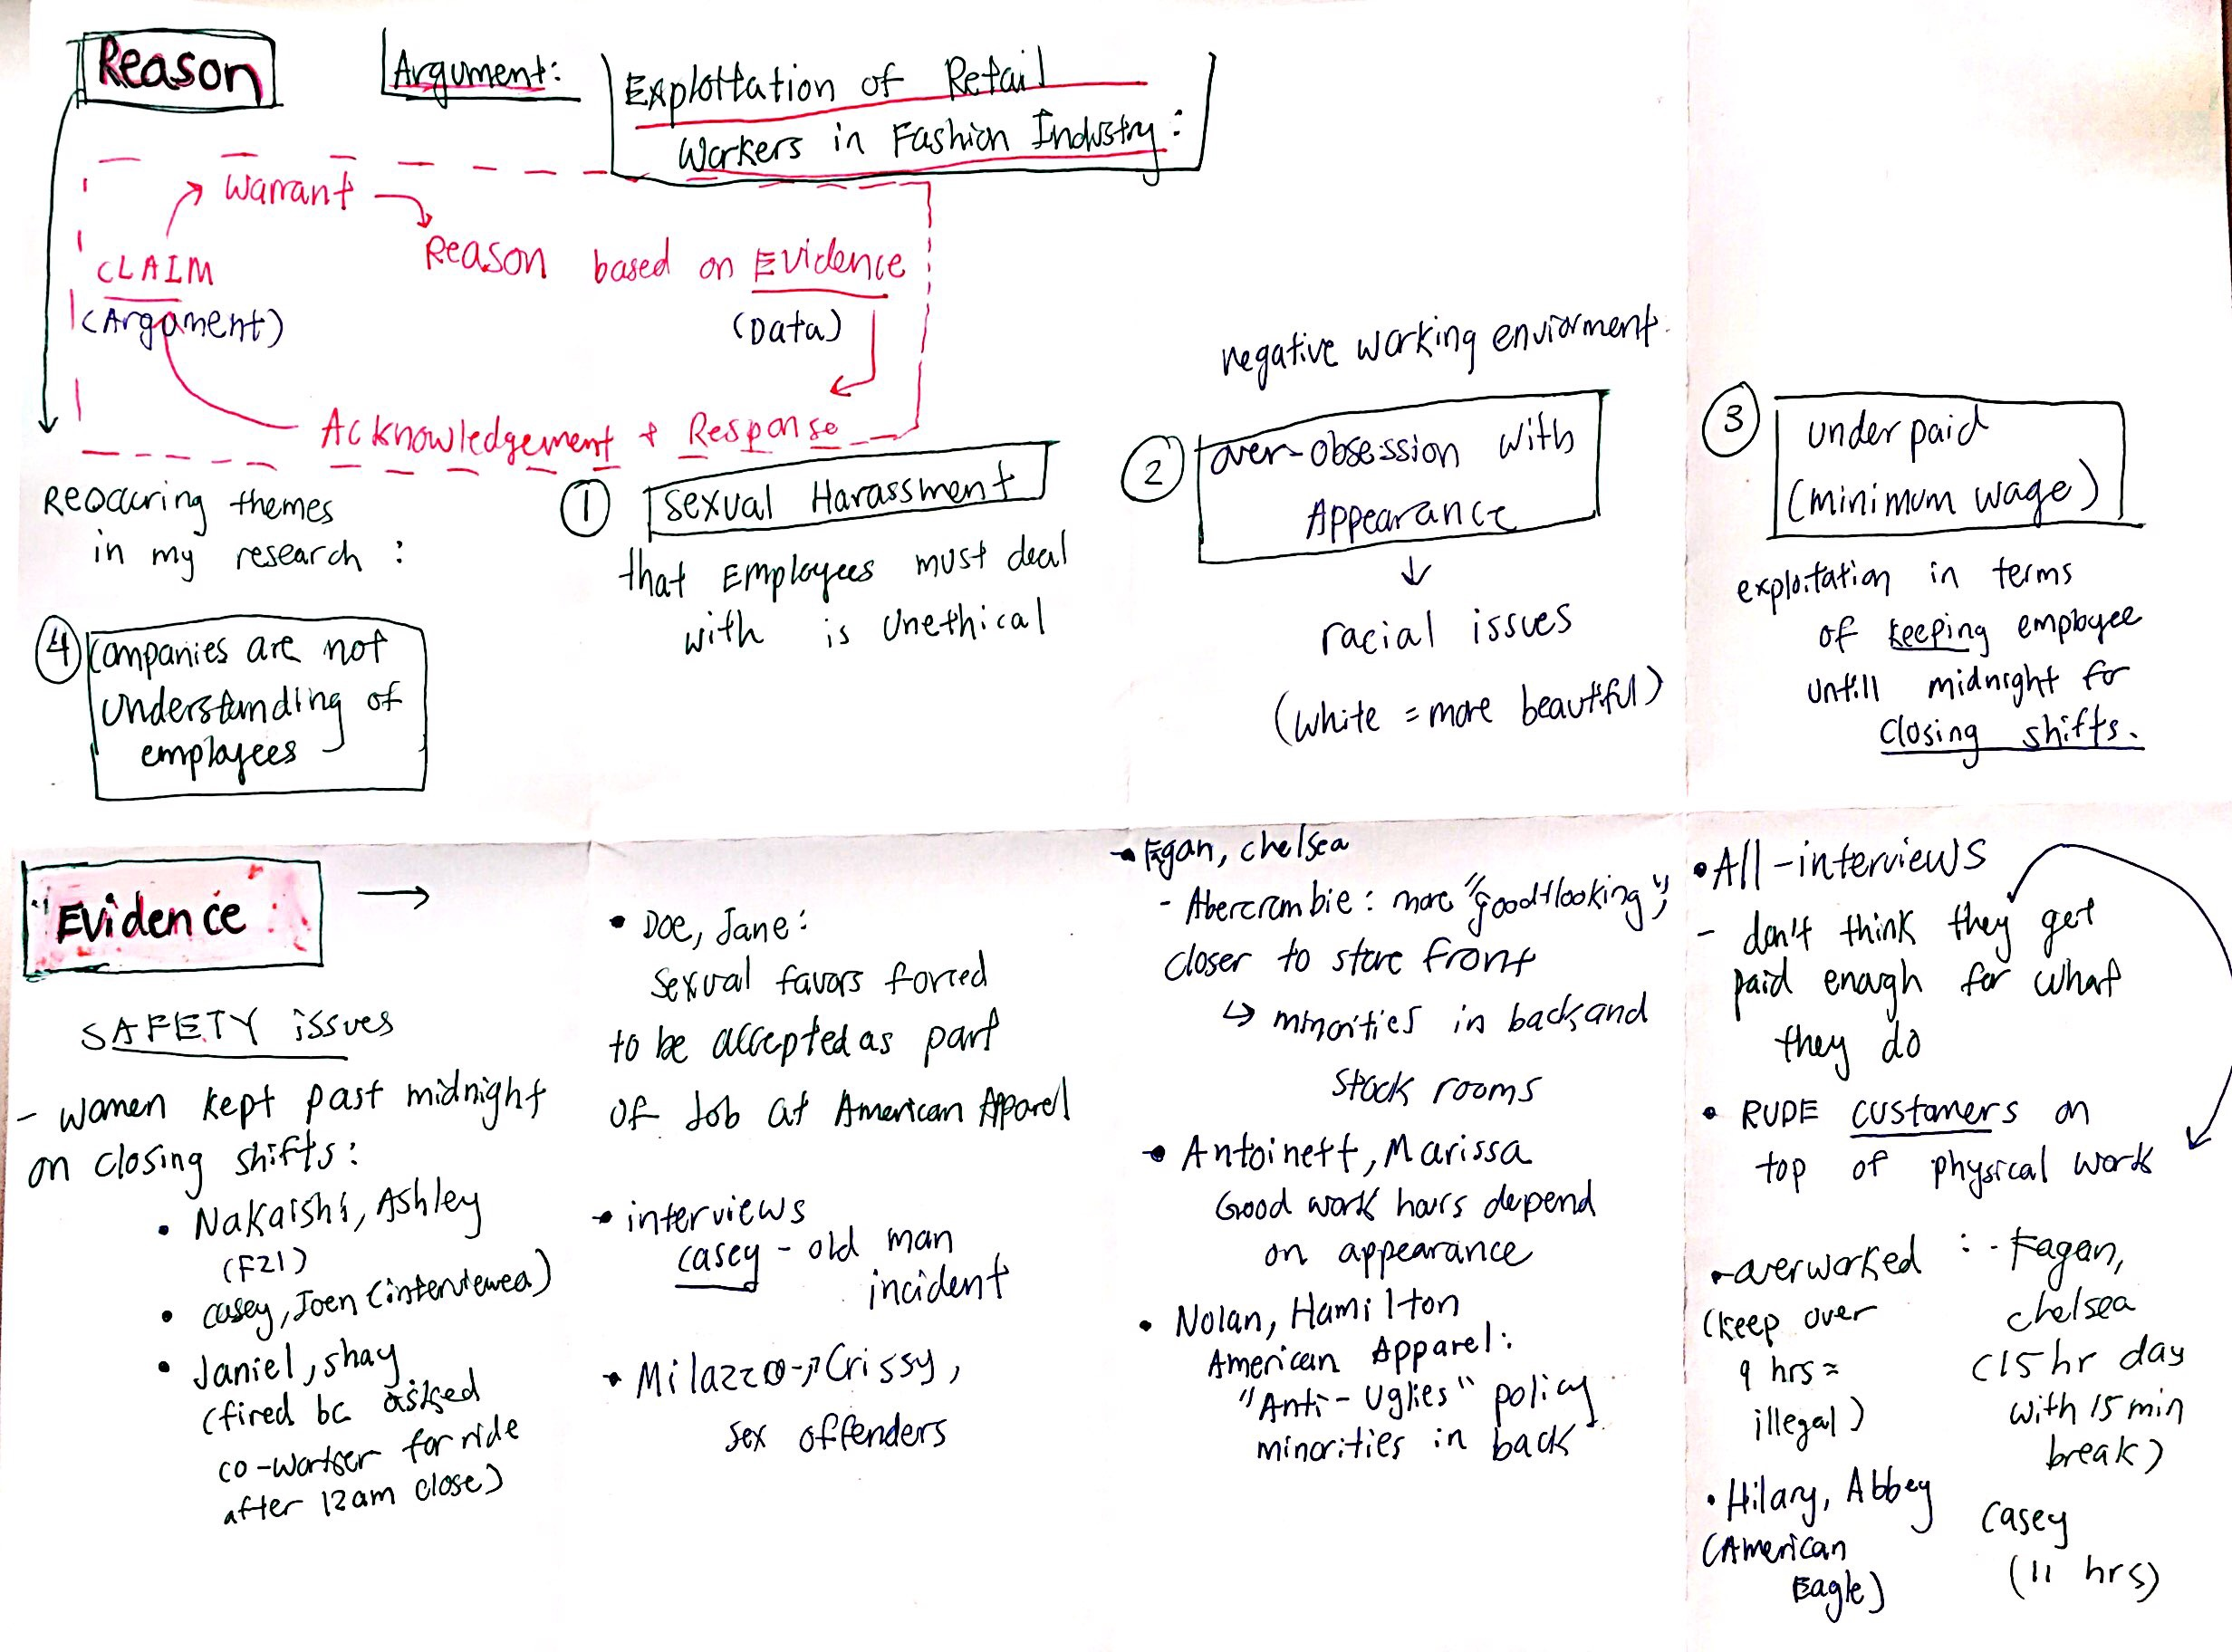 Integrative Seminar 2: Reason and Evidence Table